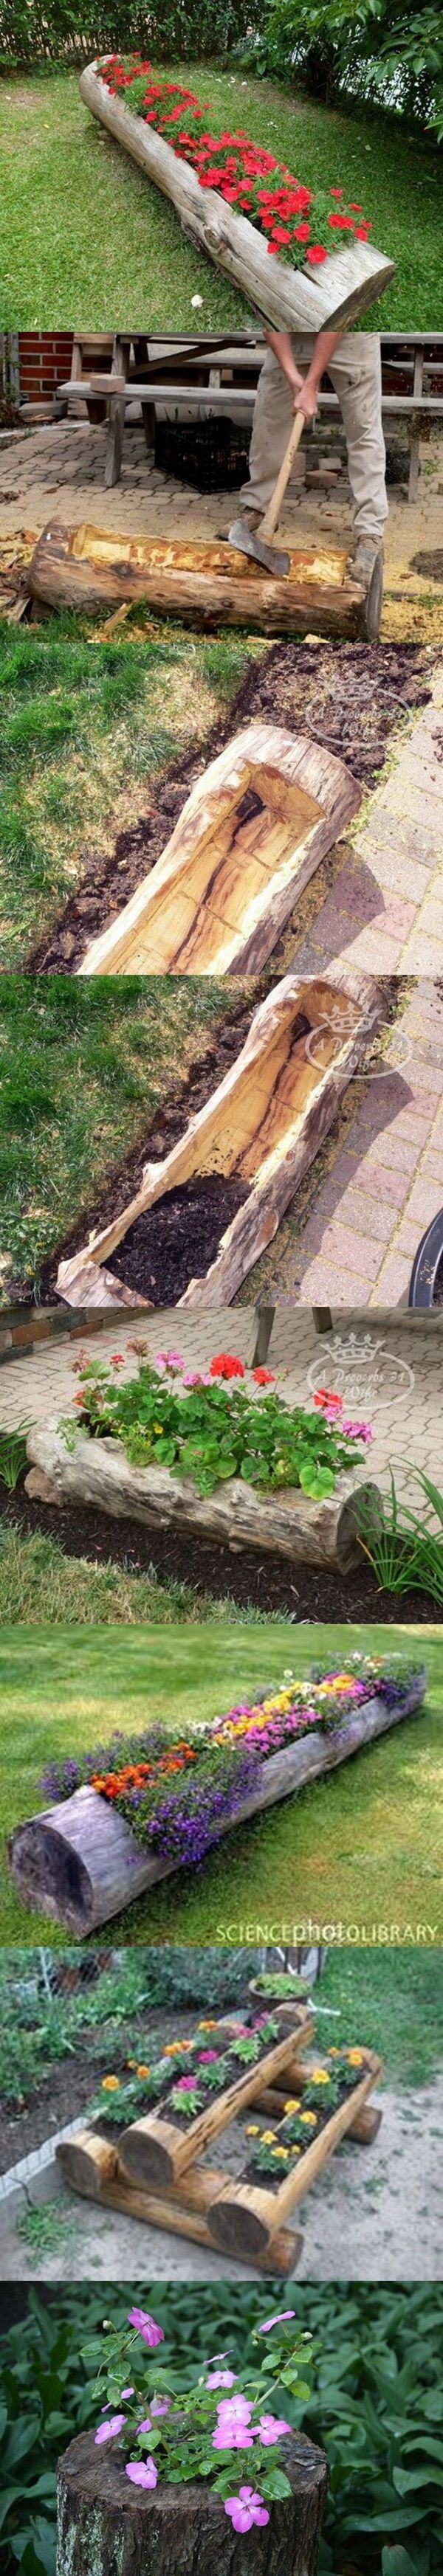 35+ Creative Garden Hacks & Tips That Every Gardener Should Know